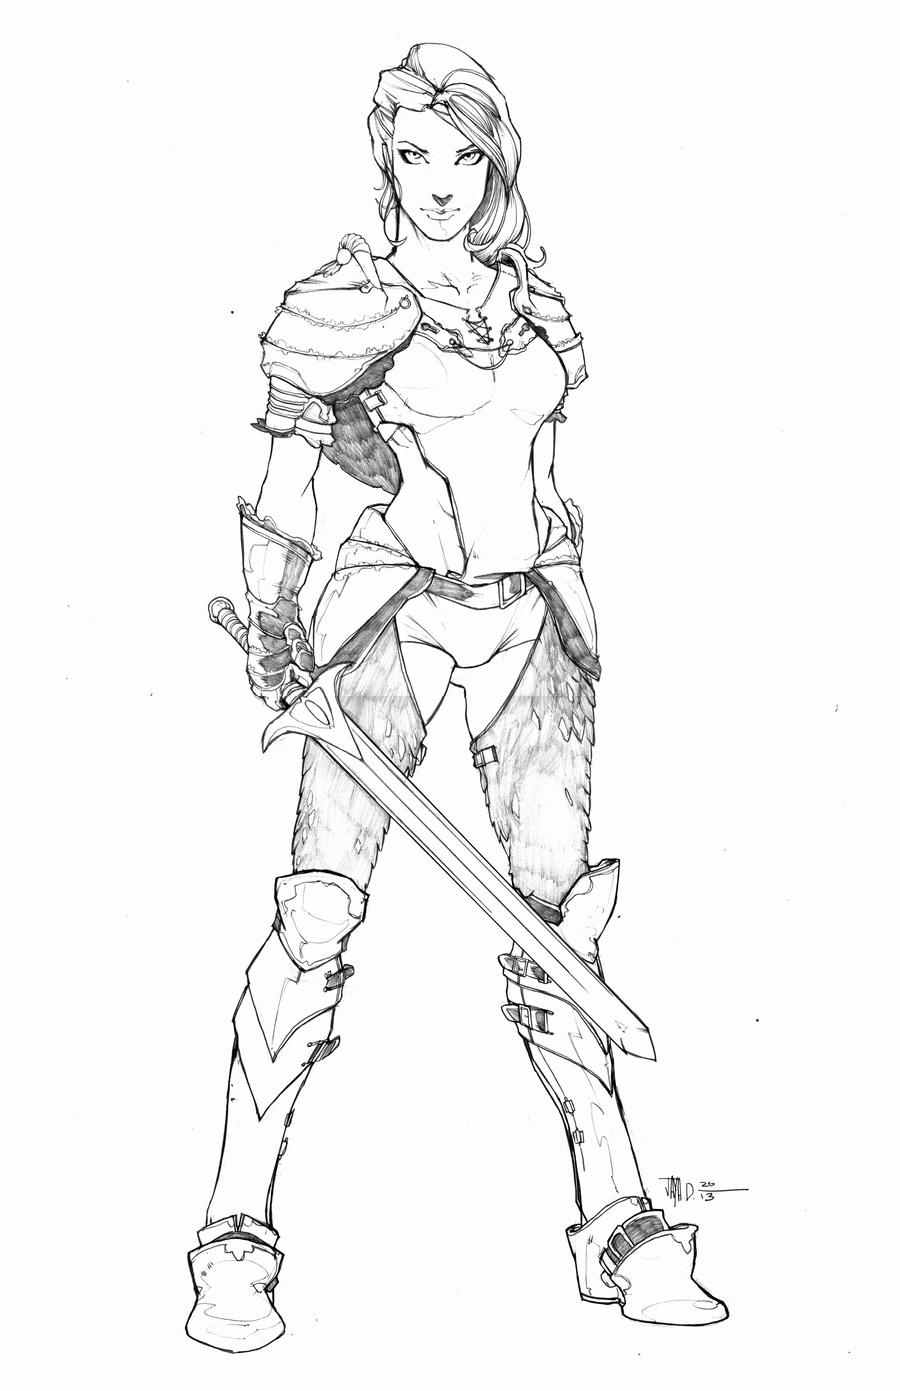 Warrior Princess by Harpokrates